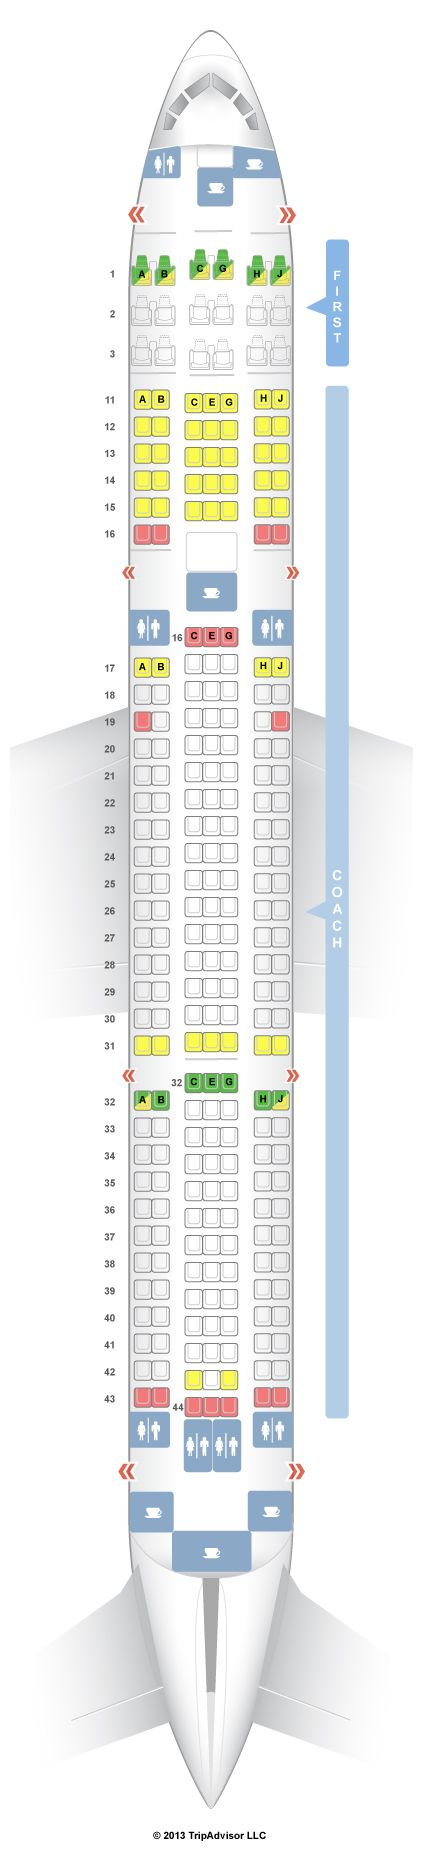 Seatguru seat map hawaiian airlines boeing er  also best images commercial aircraft air ride aviation rh pinterest